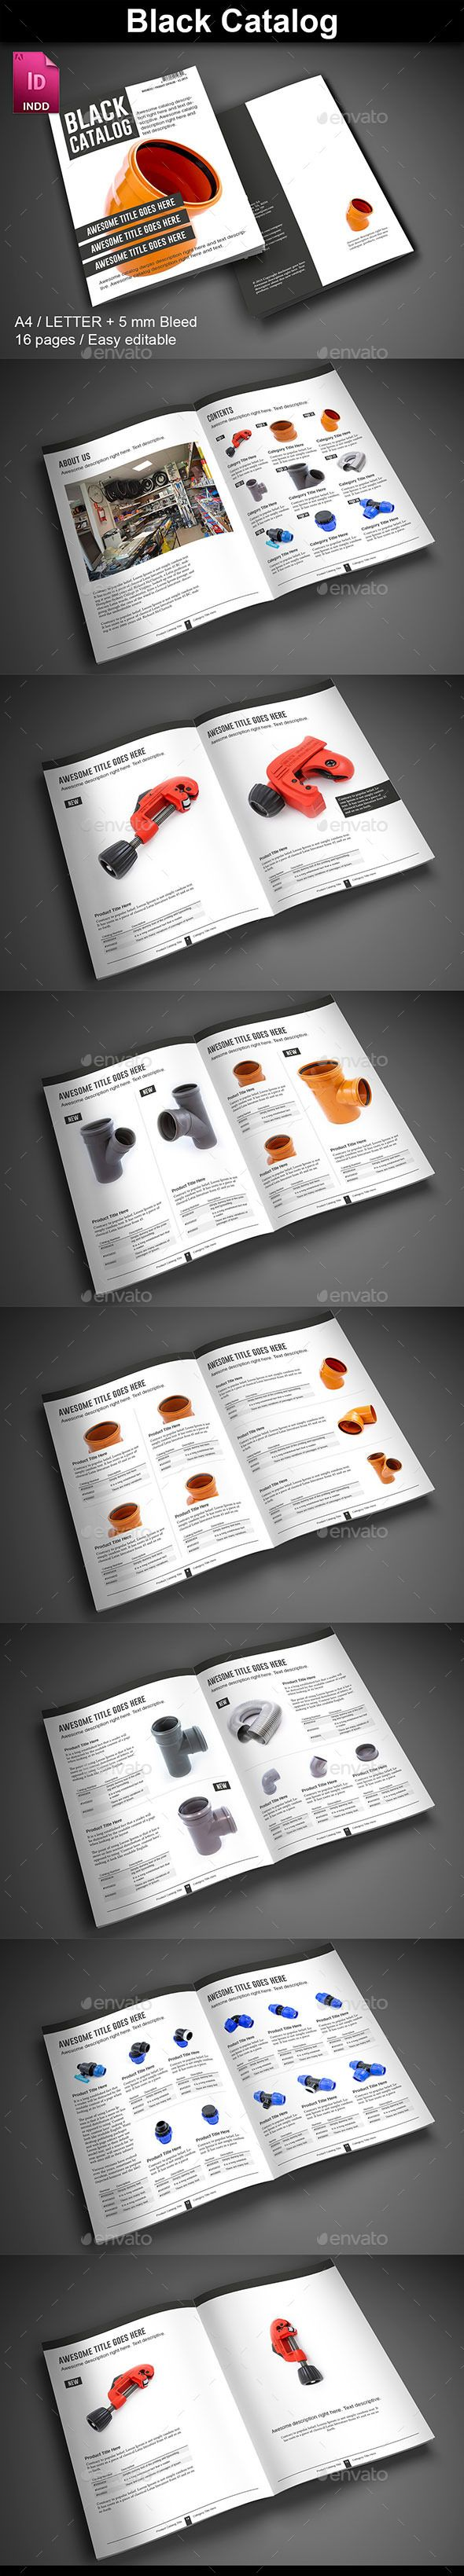 Black Catalog - Catalogs Brochures                                                                                                                                                                                 More